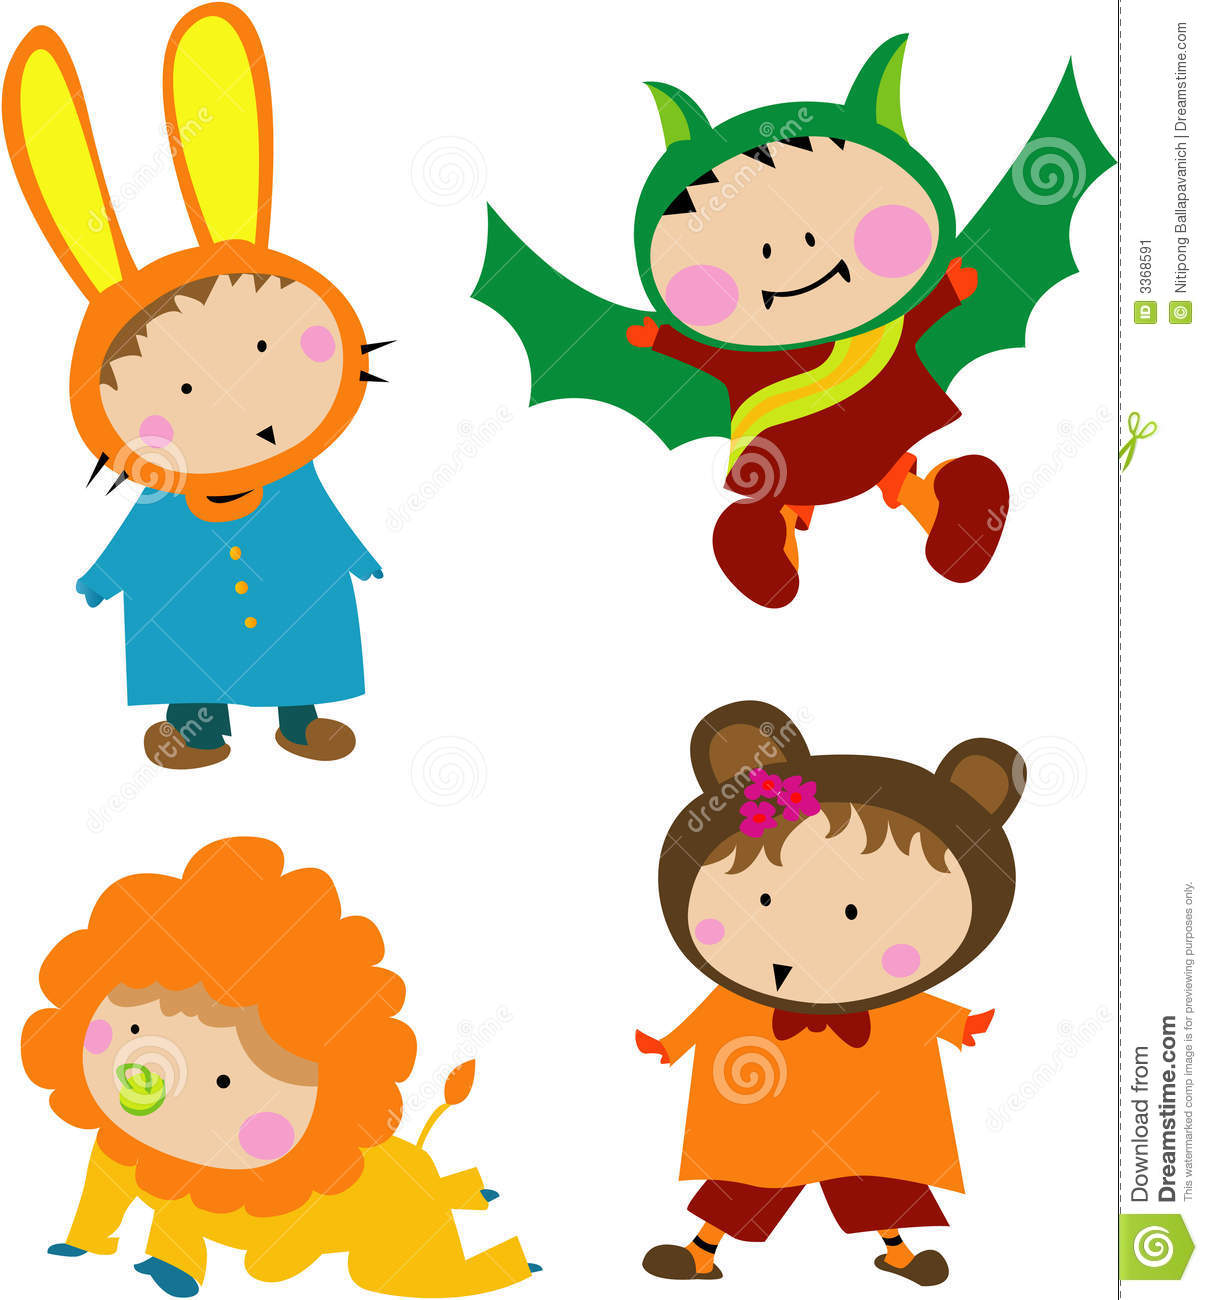 Cute Kids Clipart Free-cute kids clipart free-12